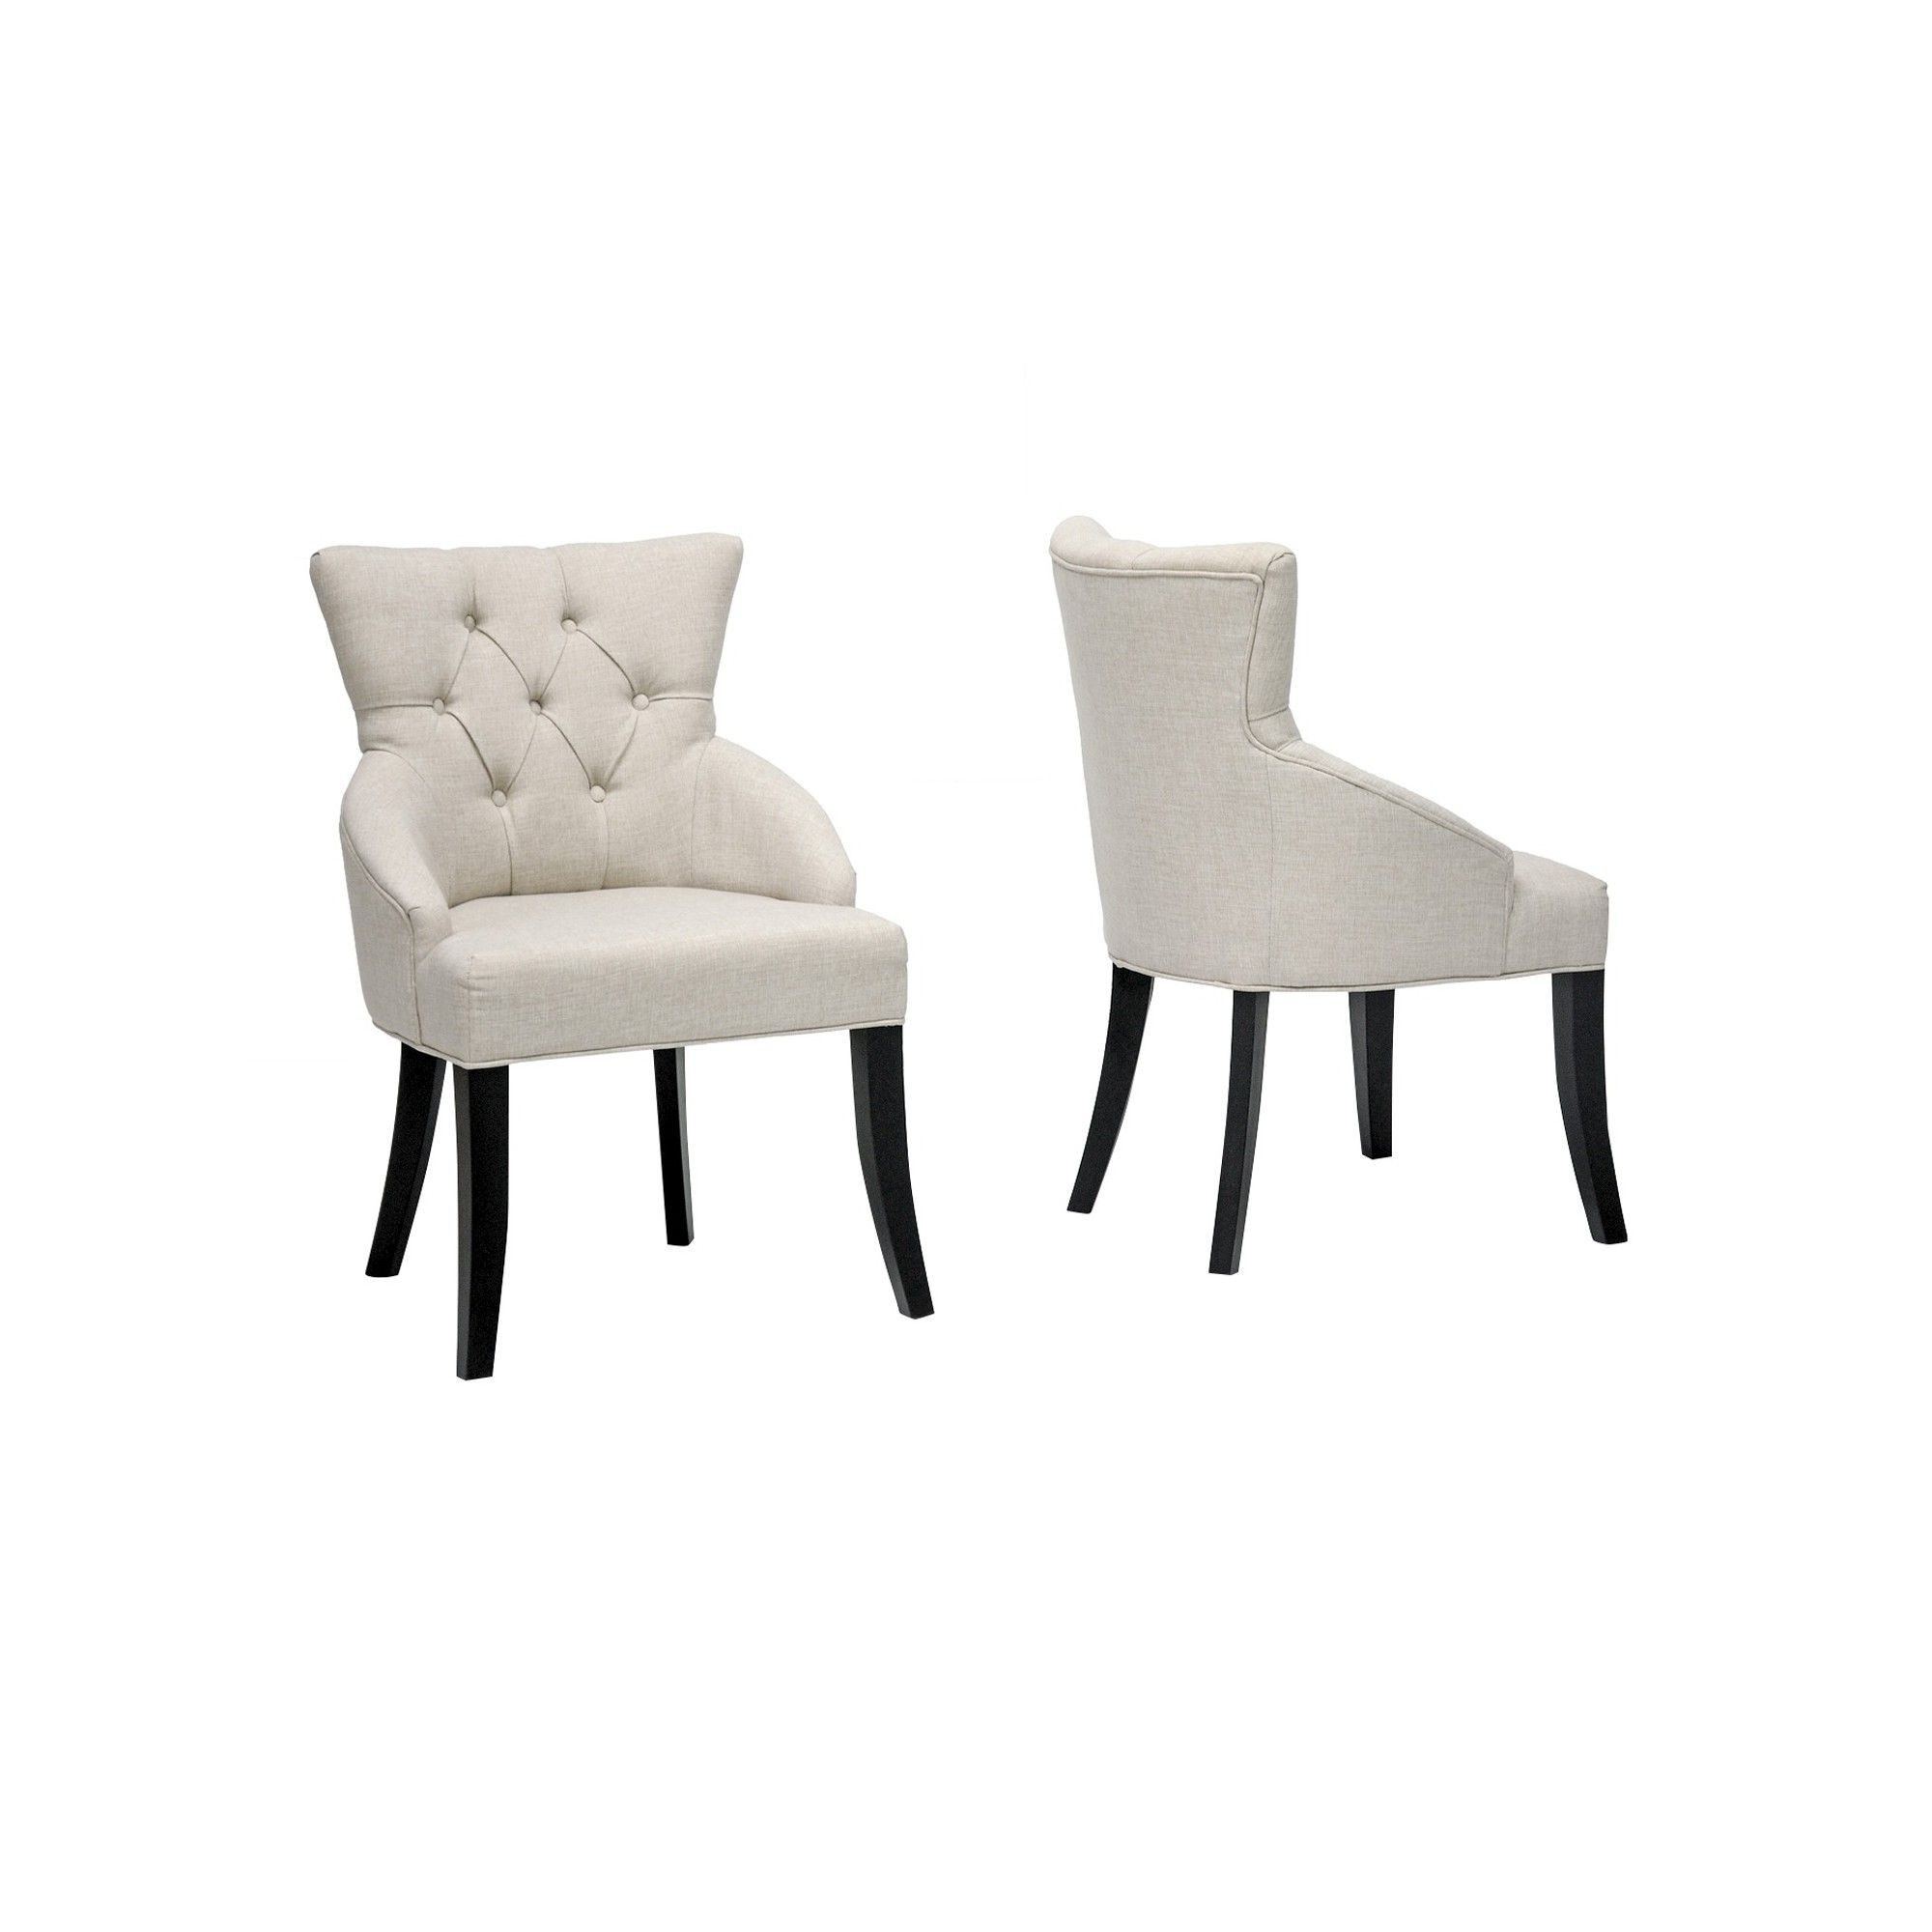 Halifax Linen Dining Chair Beige Set Of 2 Baxton Studio Linen Dining Chairs Dining Chairs Dining Room Chairs Modern